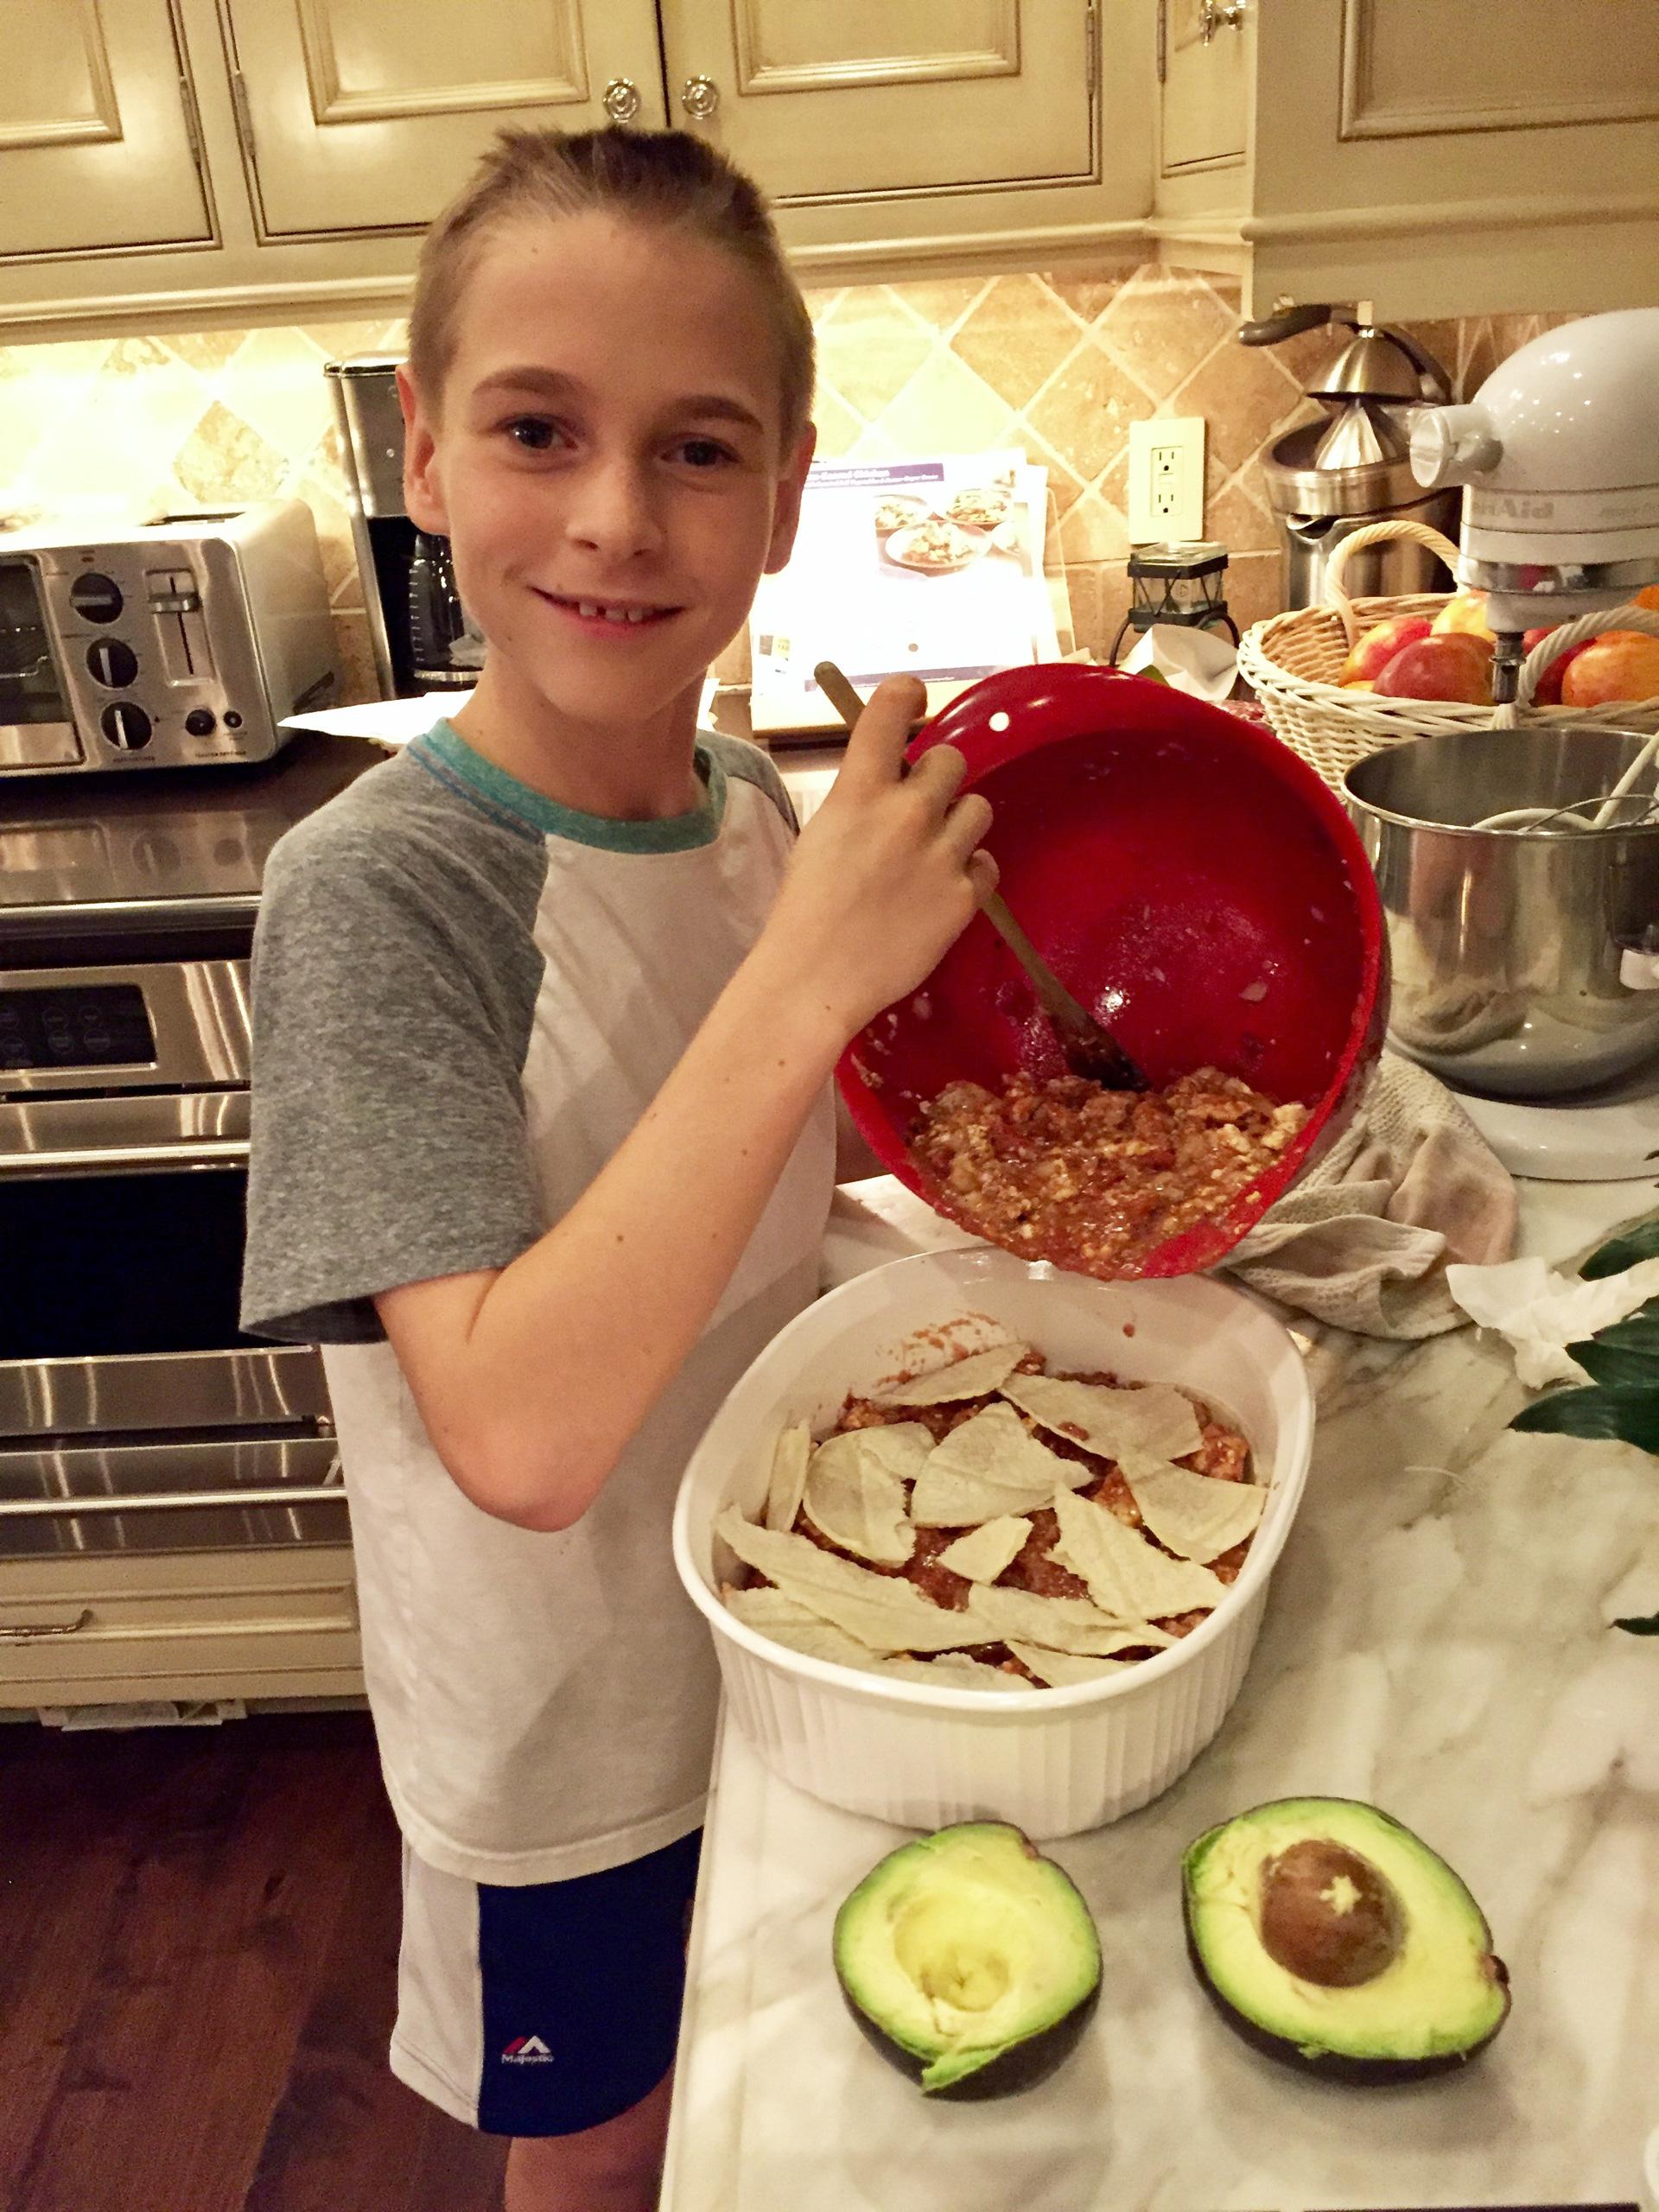 Alison Sweeney's son cooking